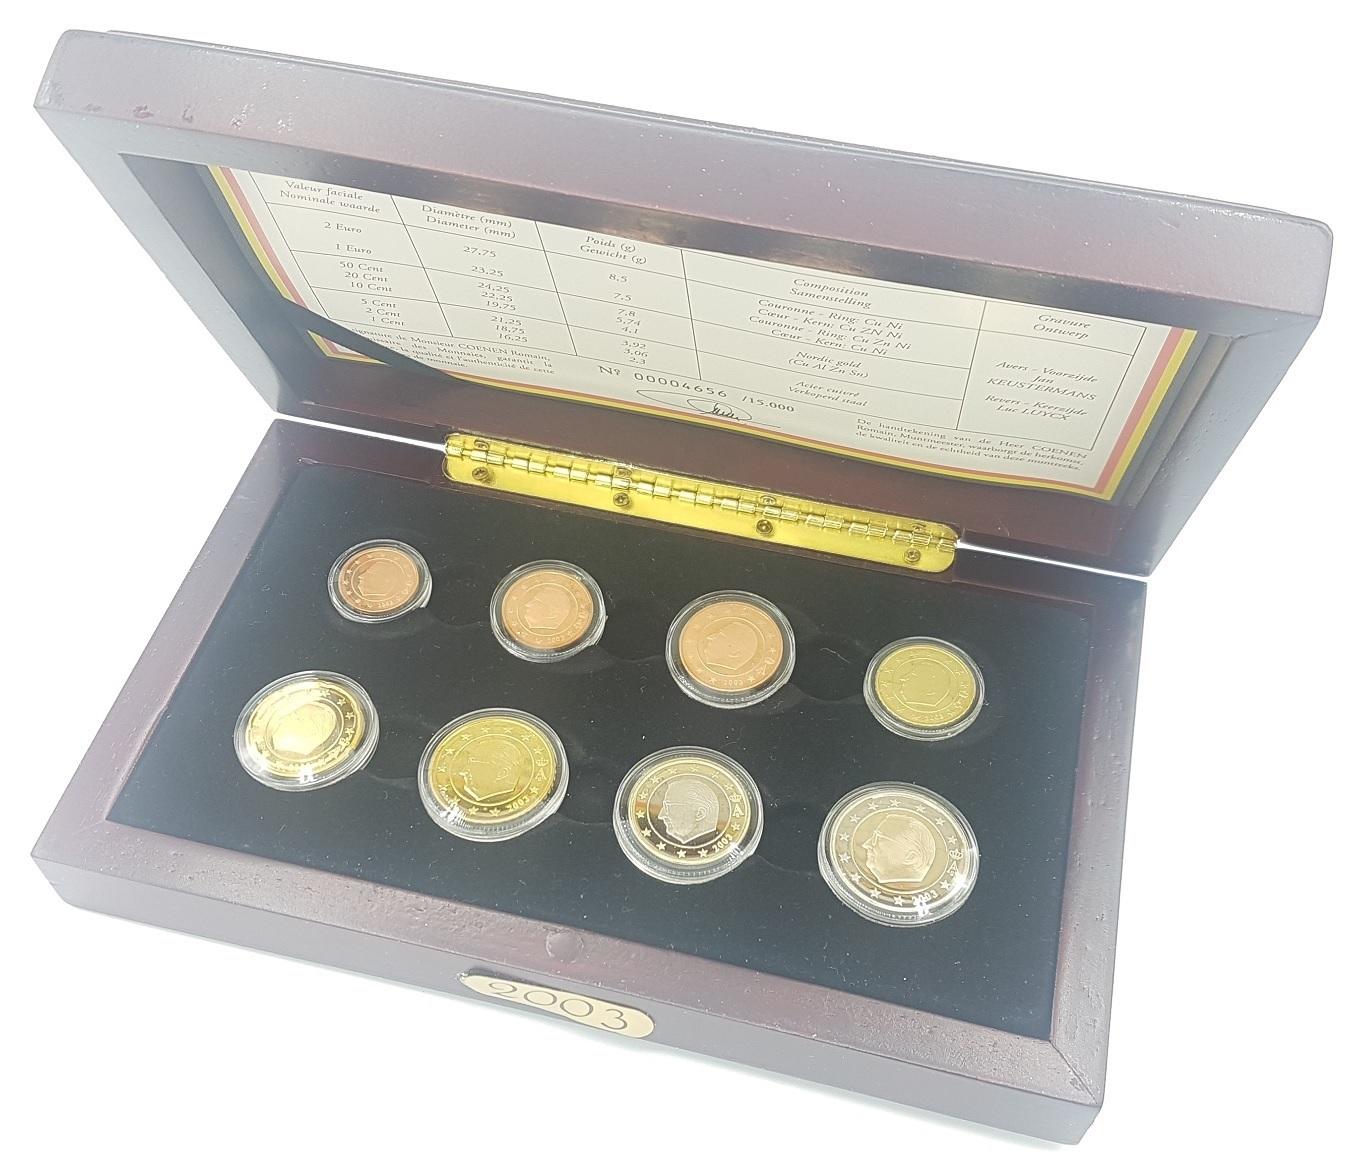 (EUR02.CofBE.2003.Cof-BE.00004656) Proof coin set Belgium 2003 (inside) (zoom)